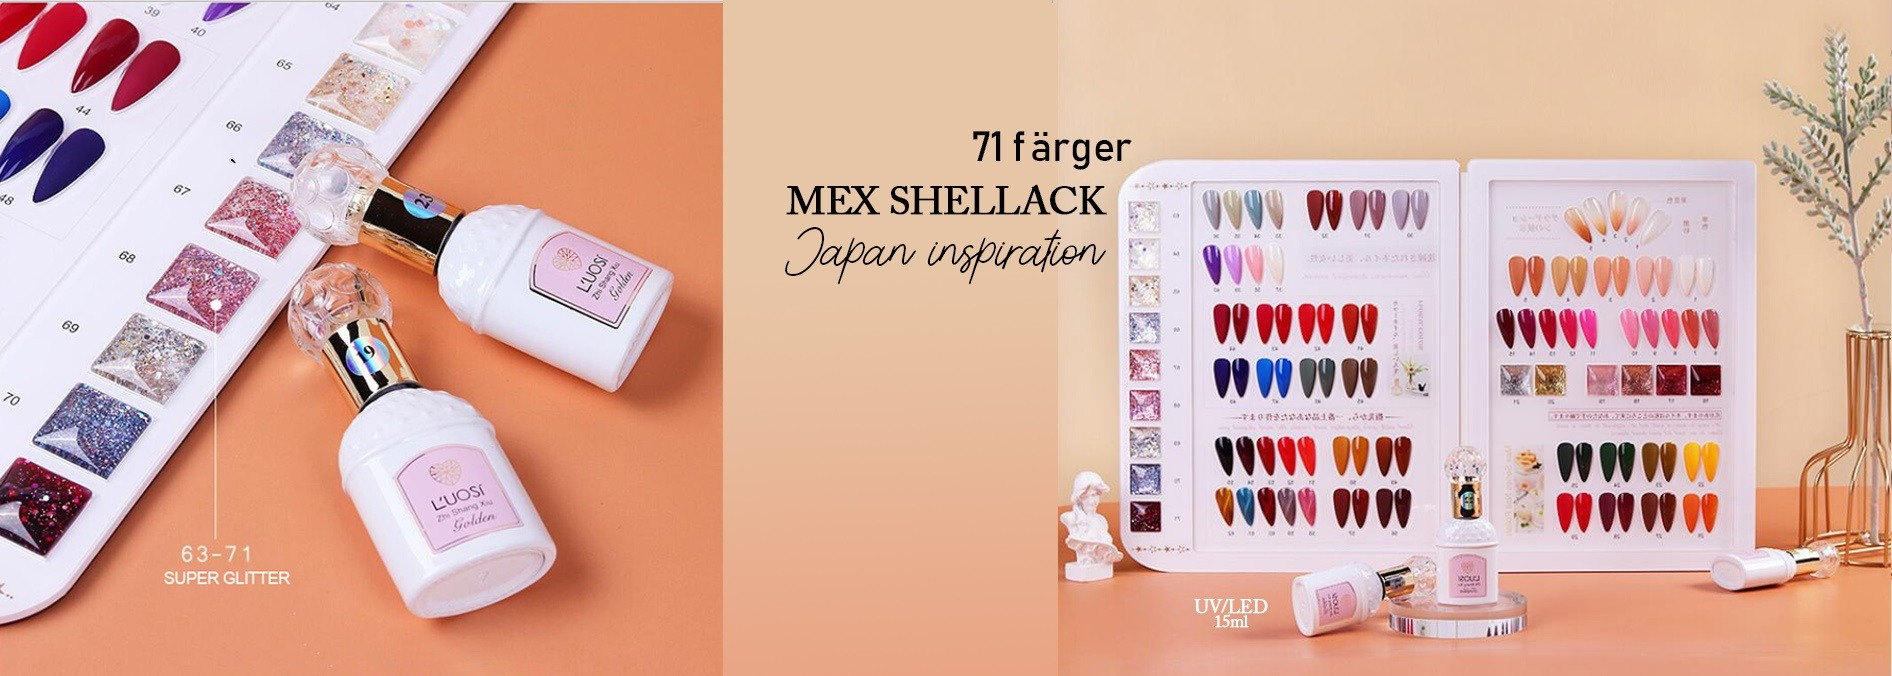 Gellack shellack manikyr nagelprodukter